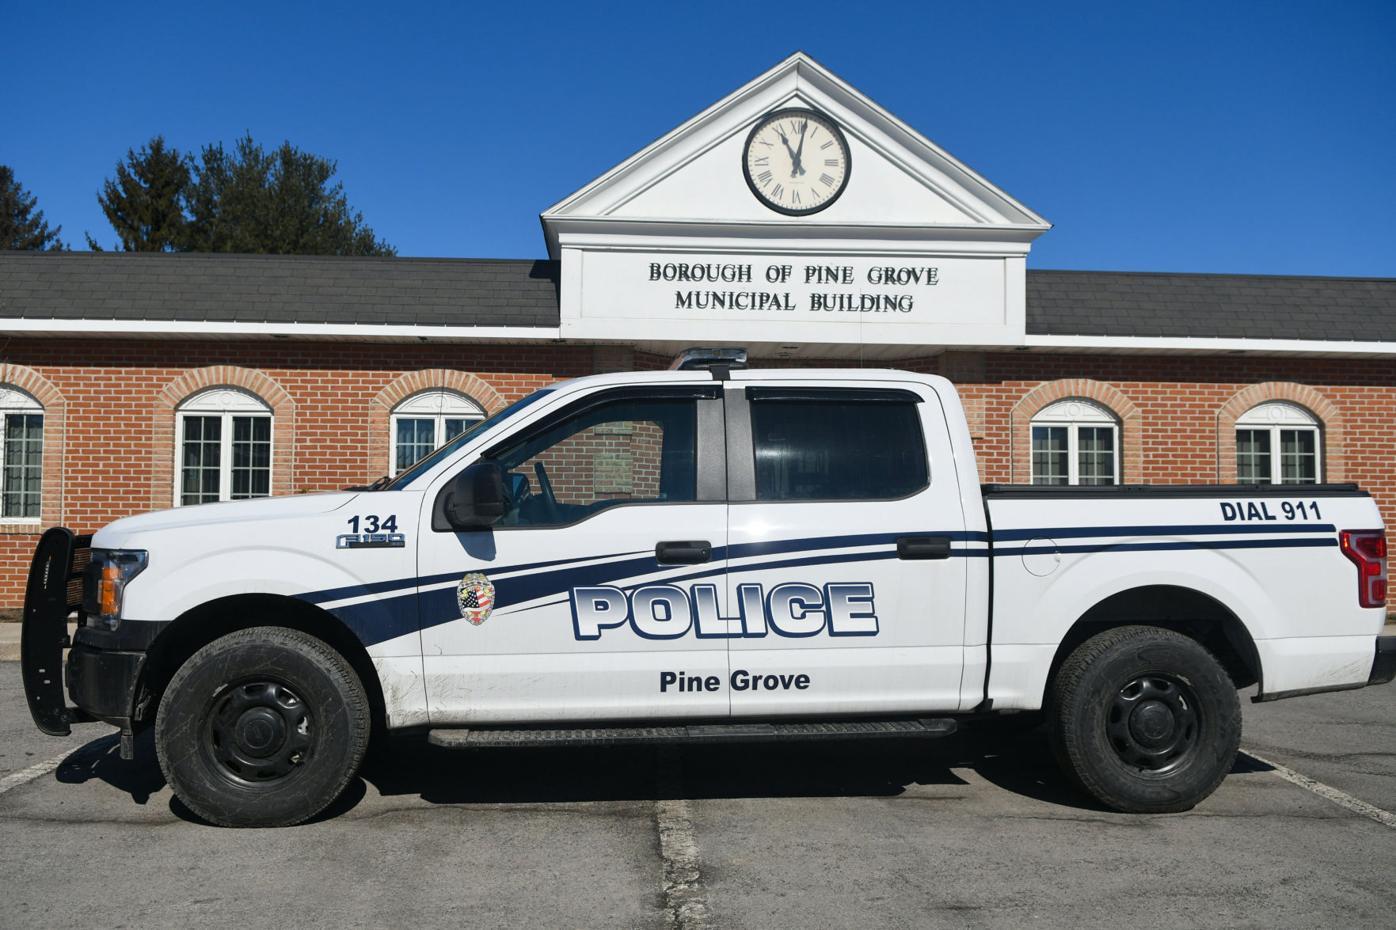 PINE GROVE POLICE